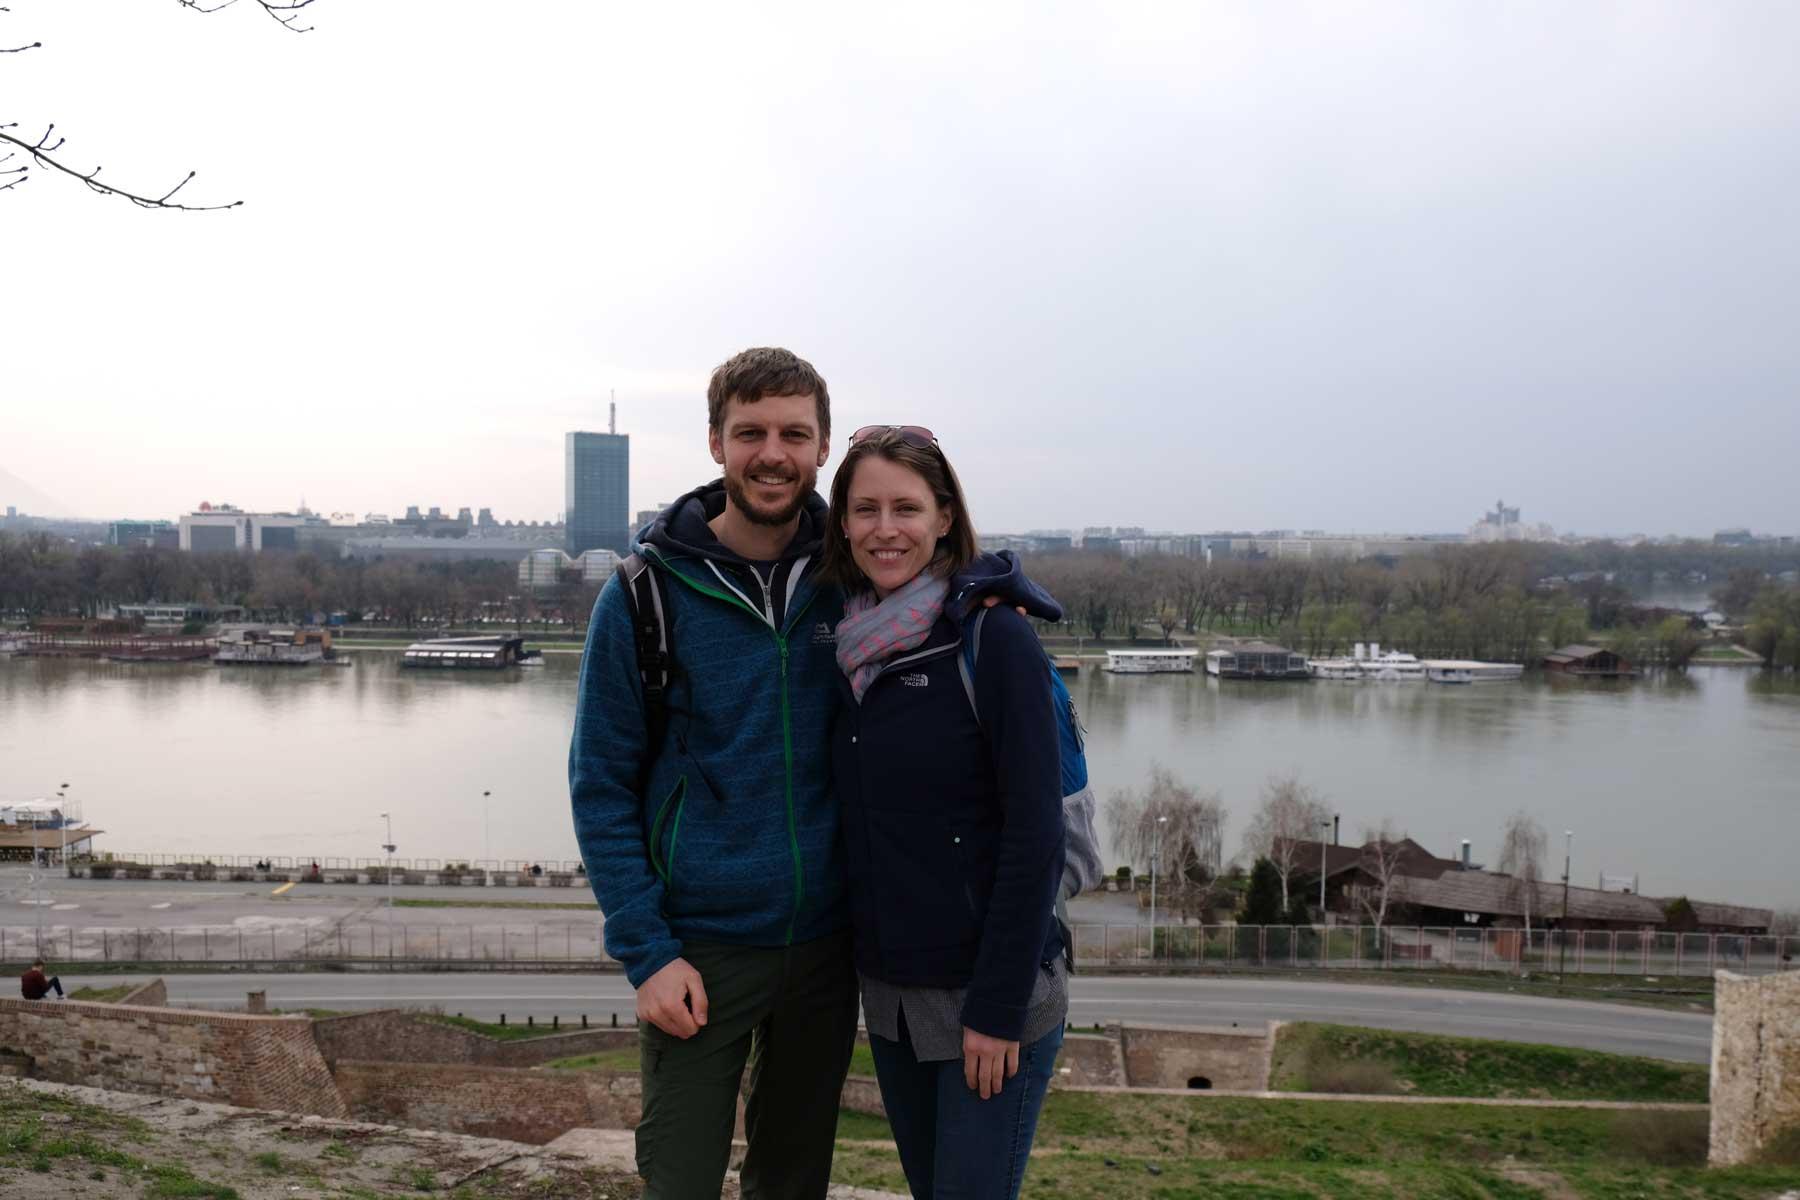 Blick auf die Save, die hier in die Donau mündet